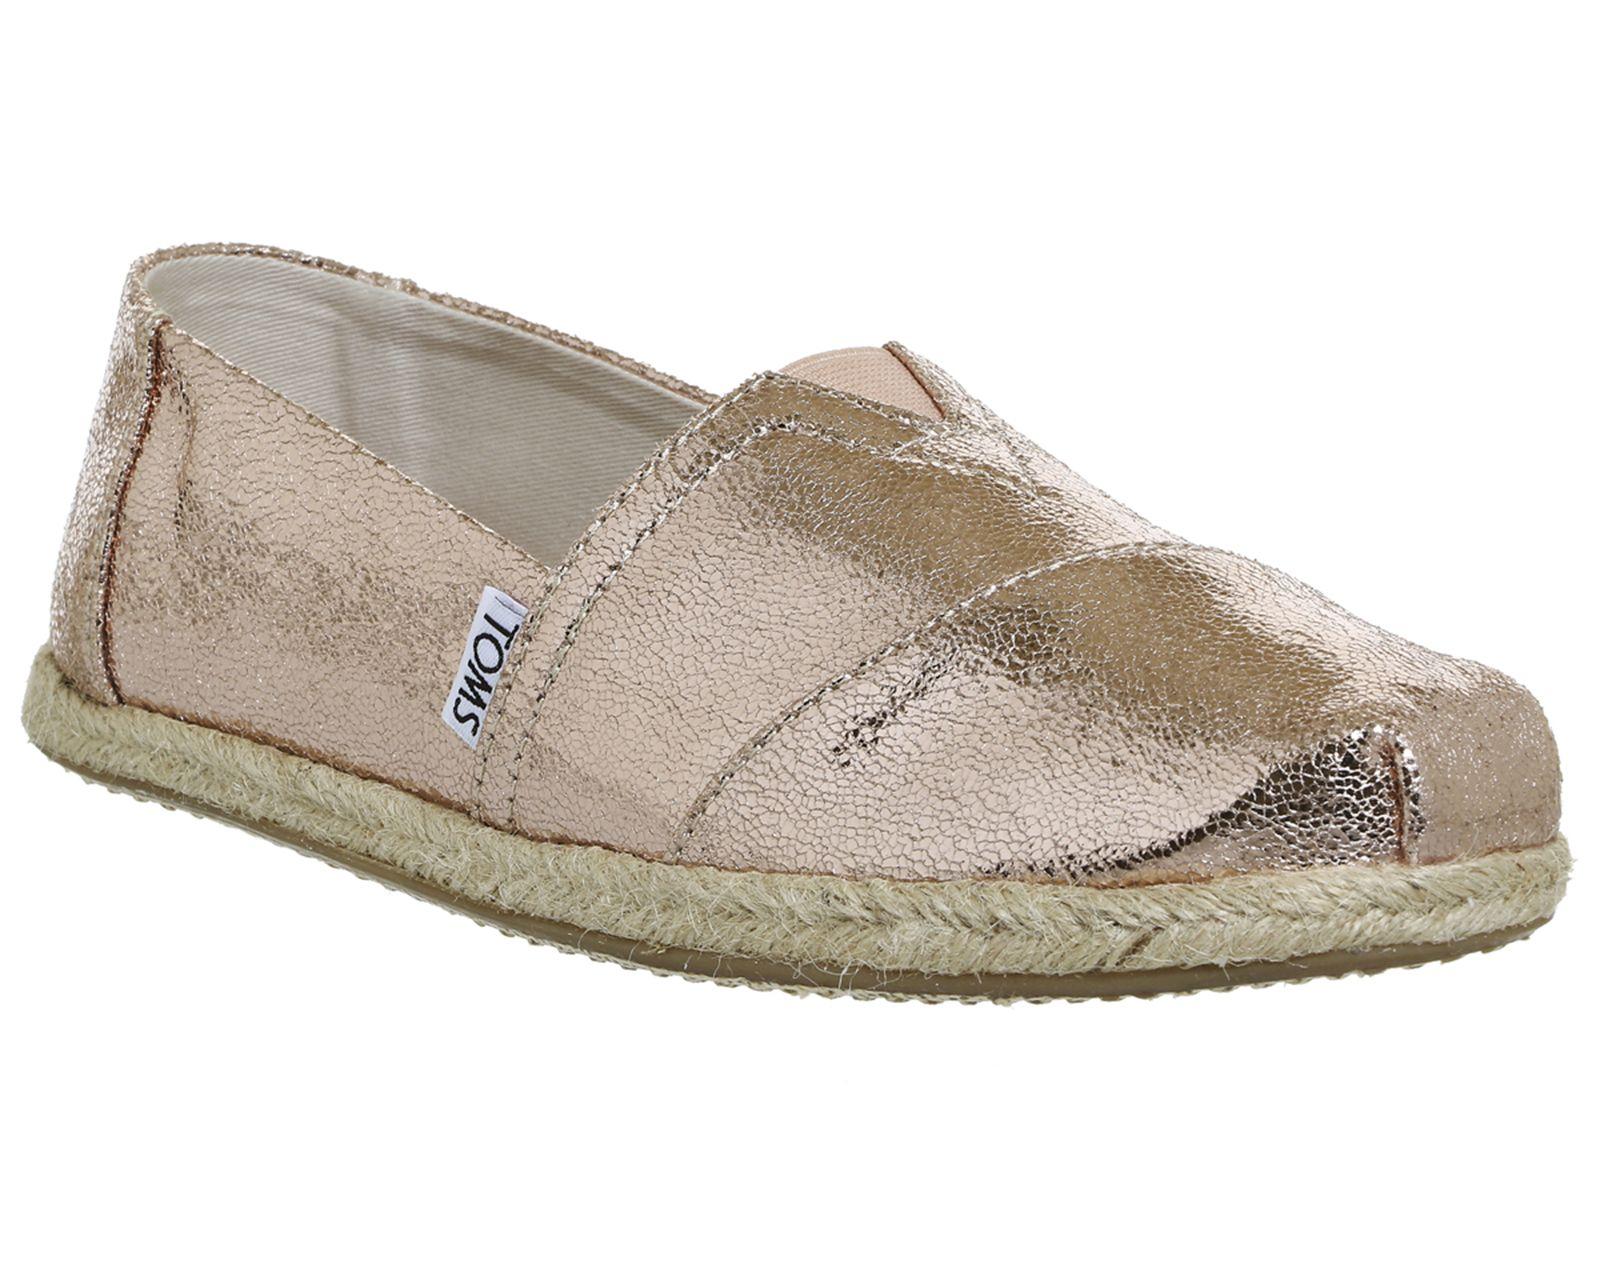 Toms Seasonal Classic Slip On Rose Gold Metallic Exclusive - Flats